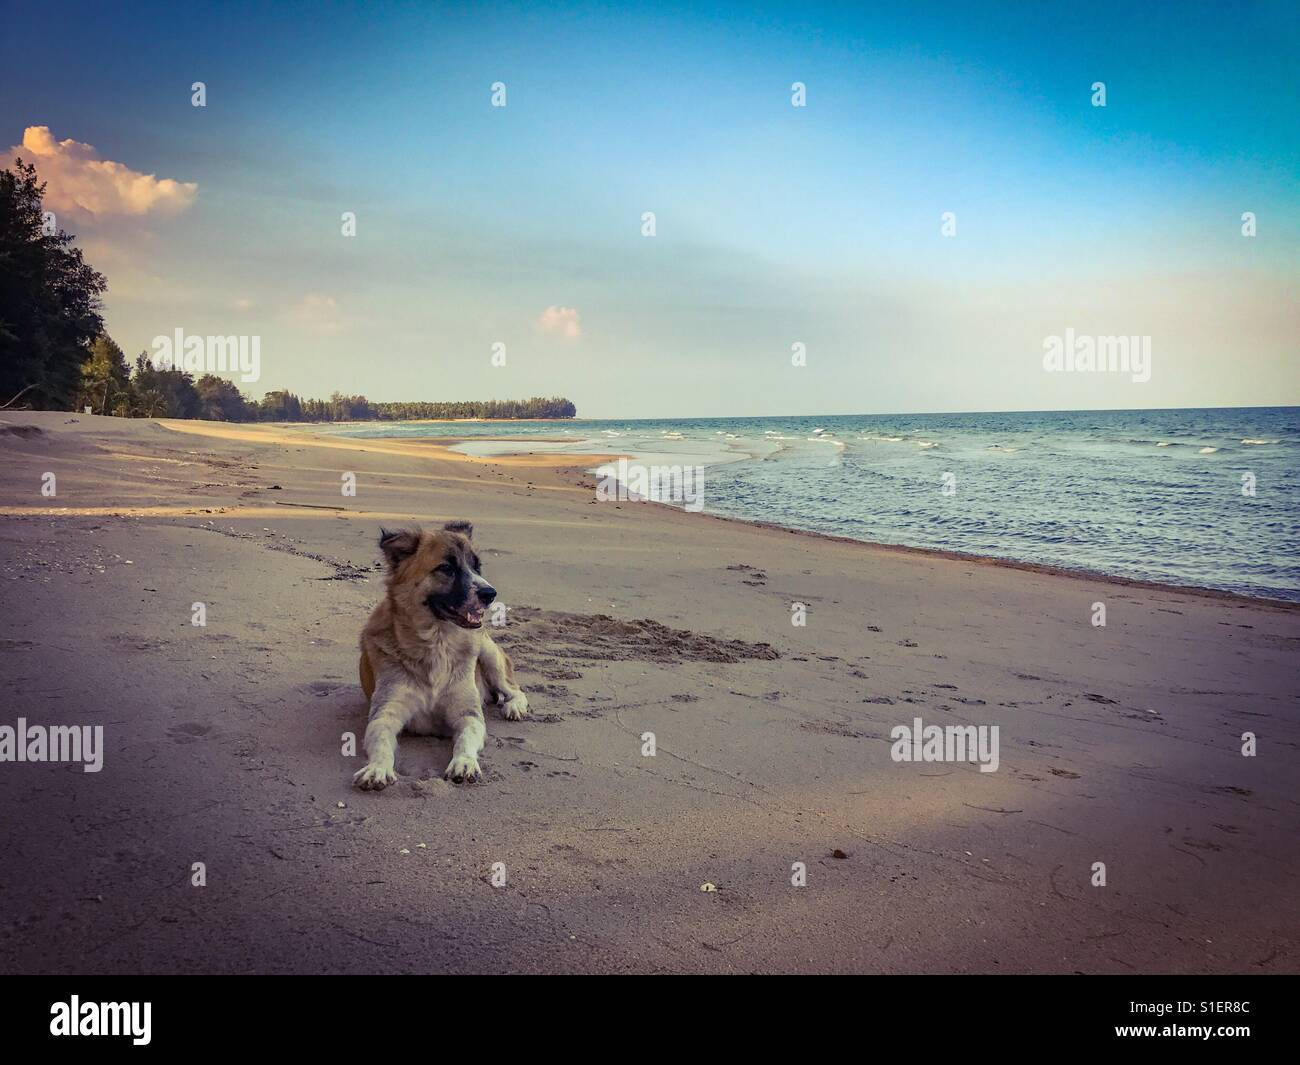 A dog on tropical sandy beach in Thailand Stock Photo